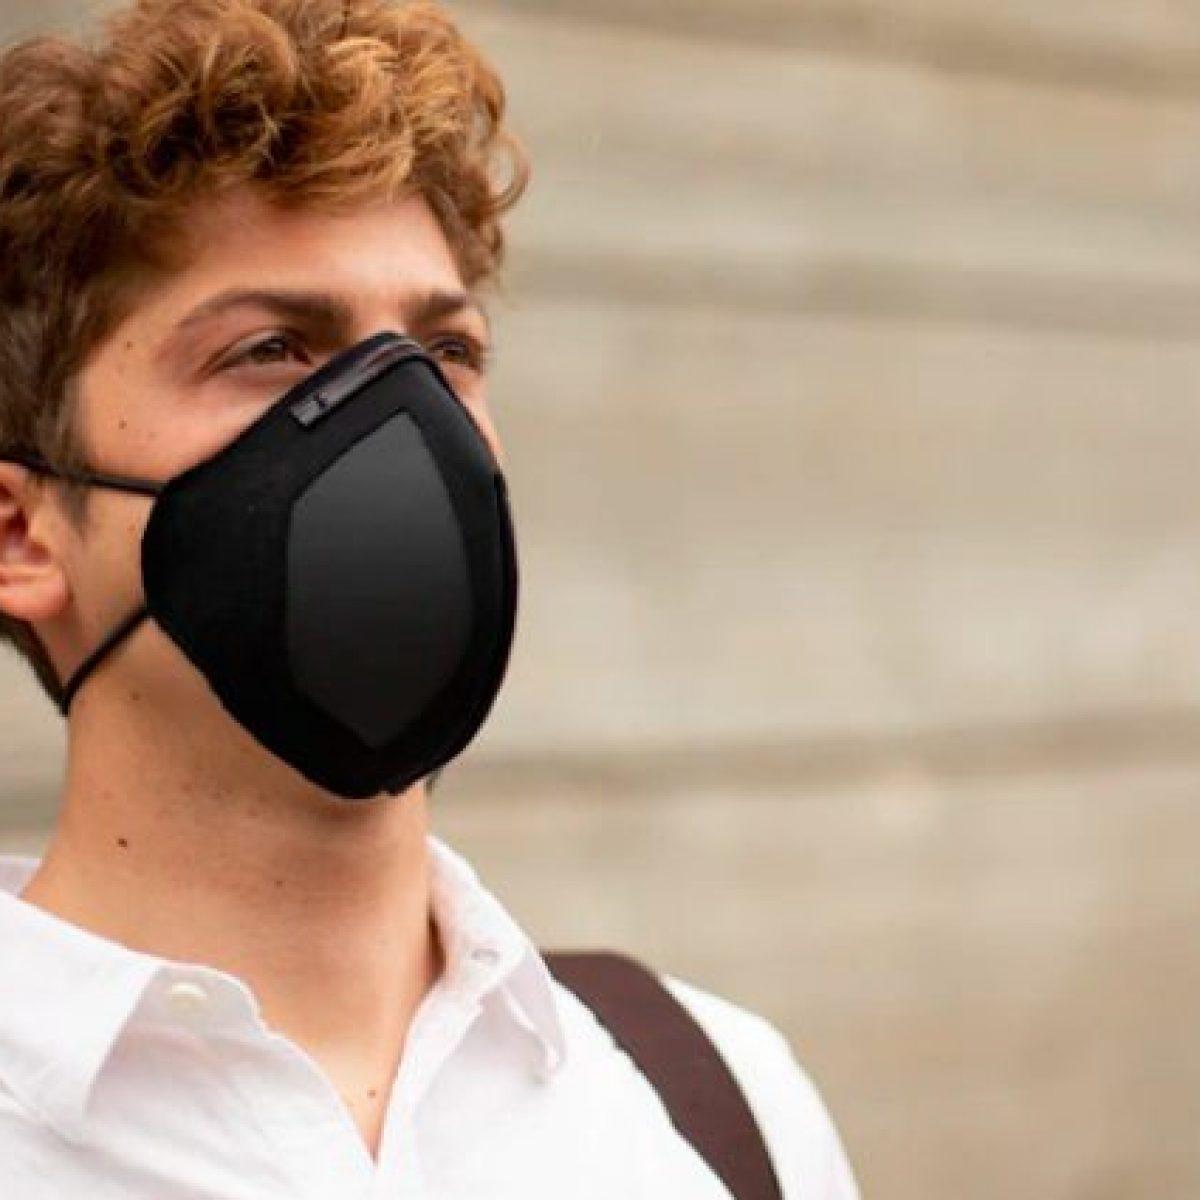 maschera n95 antismog